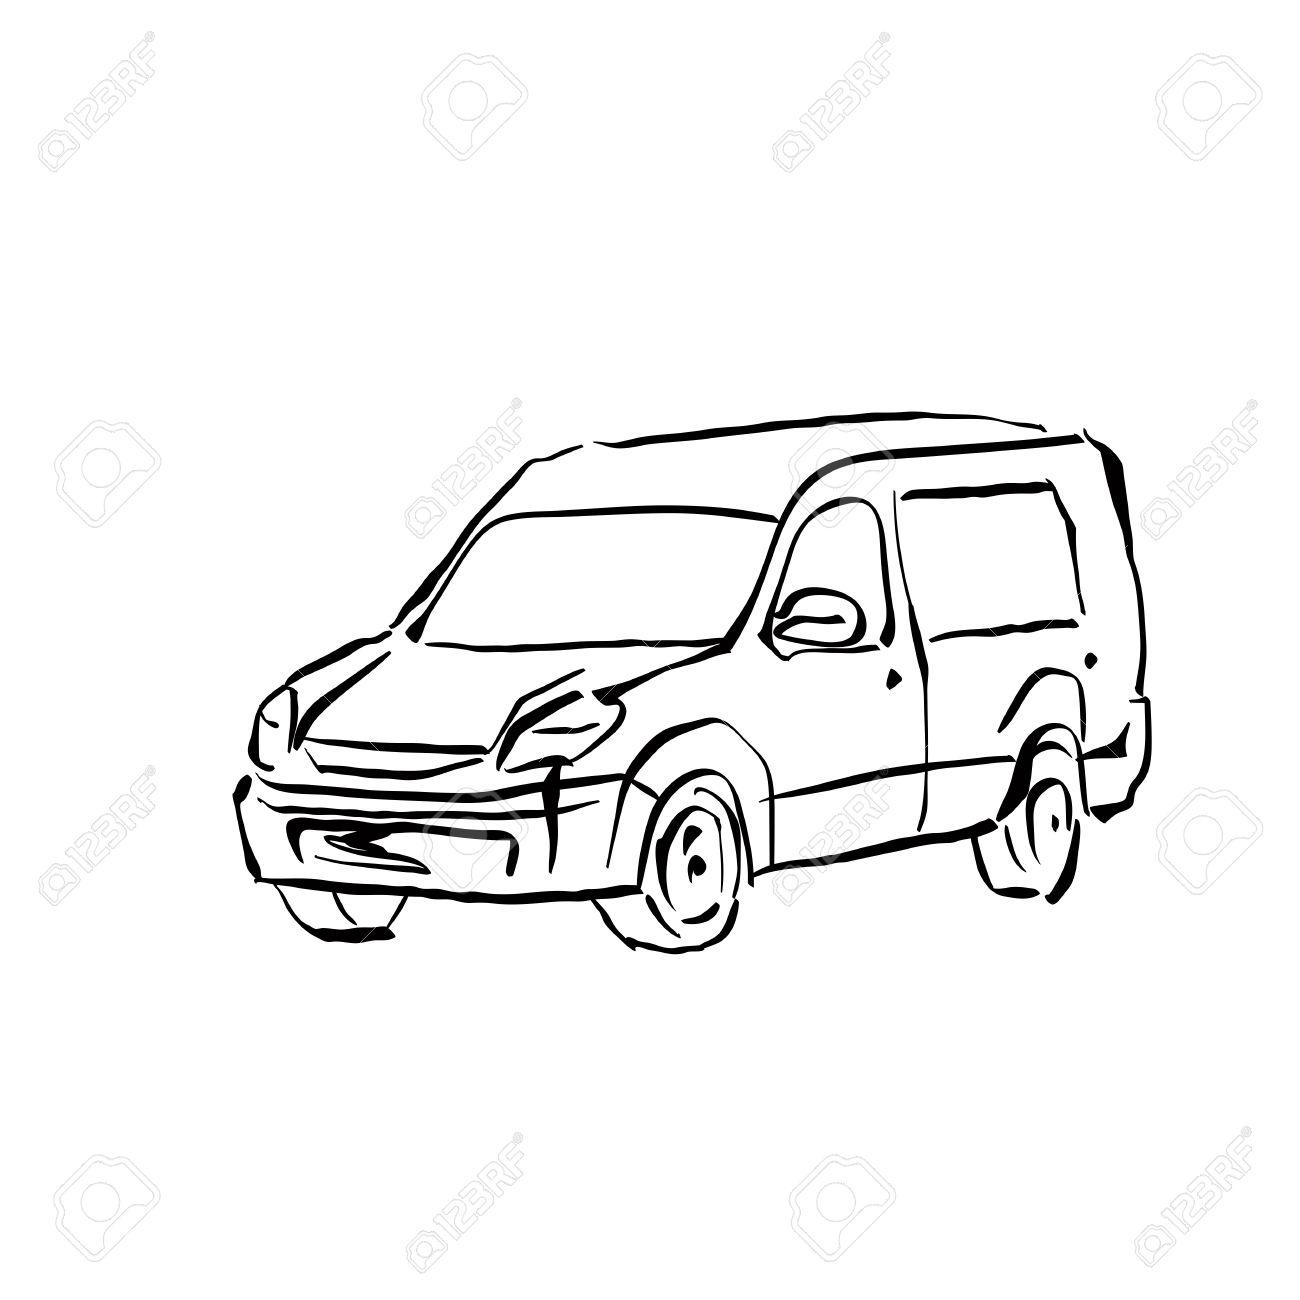 1300x1300 Drawn Car Black And White